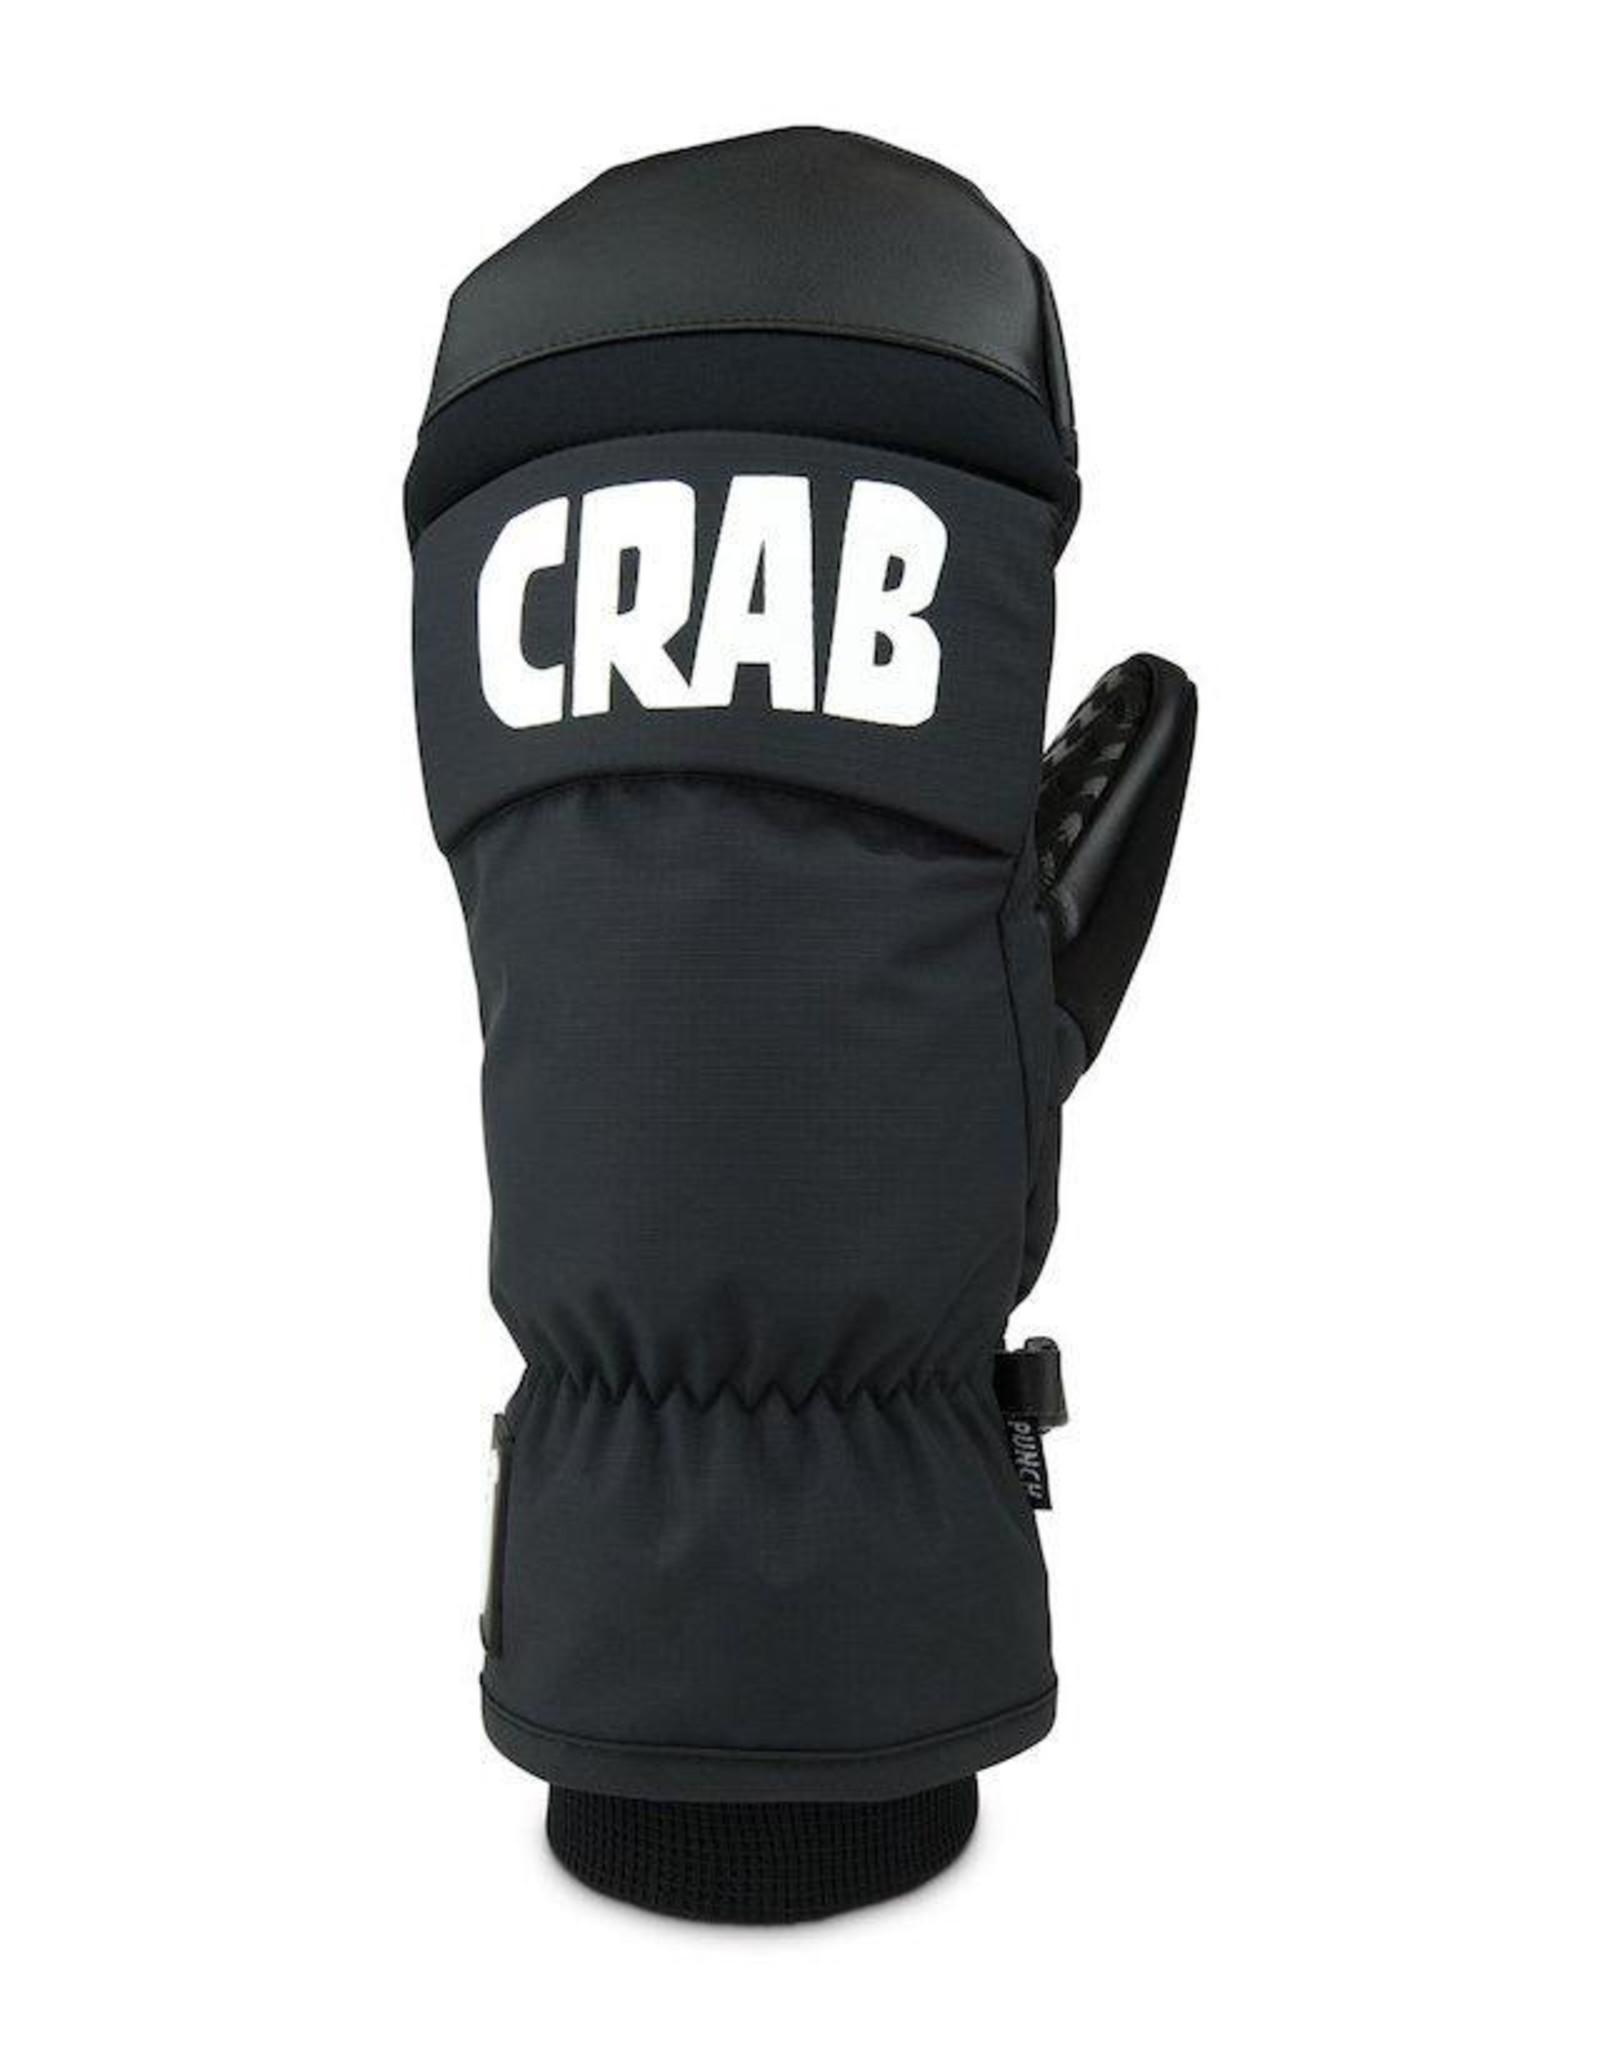 Crab Grab Crab Grab - Punch Mitt - L - Black